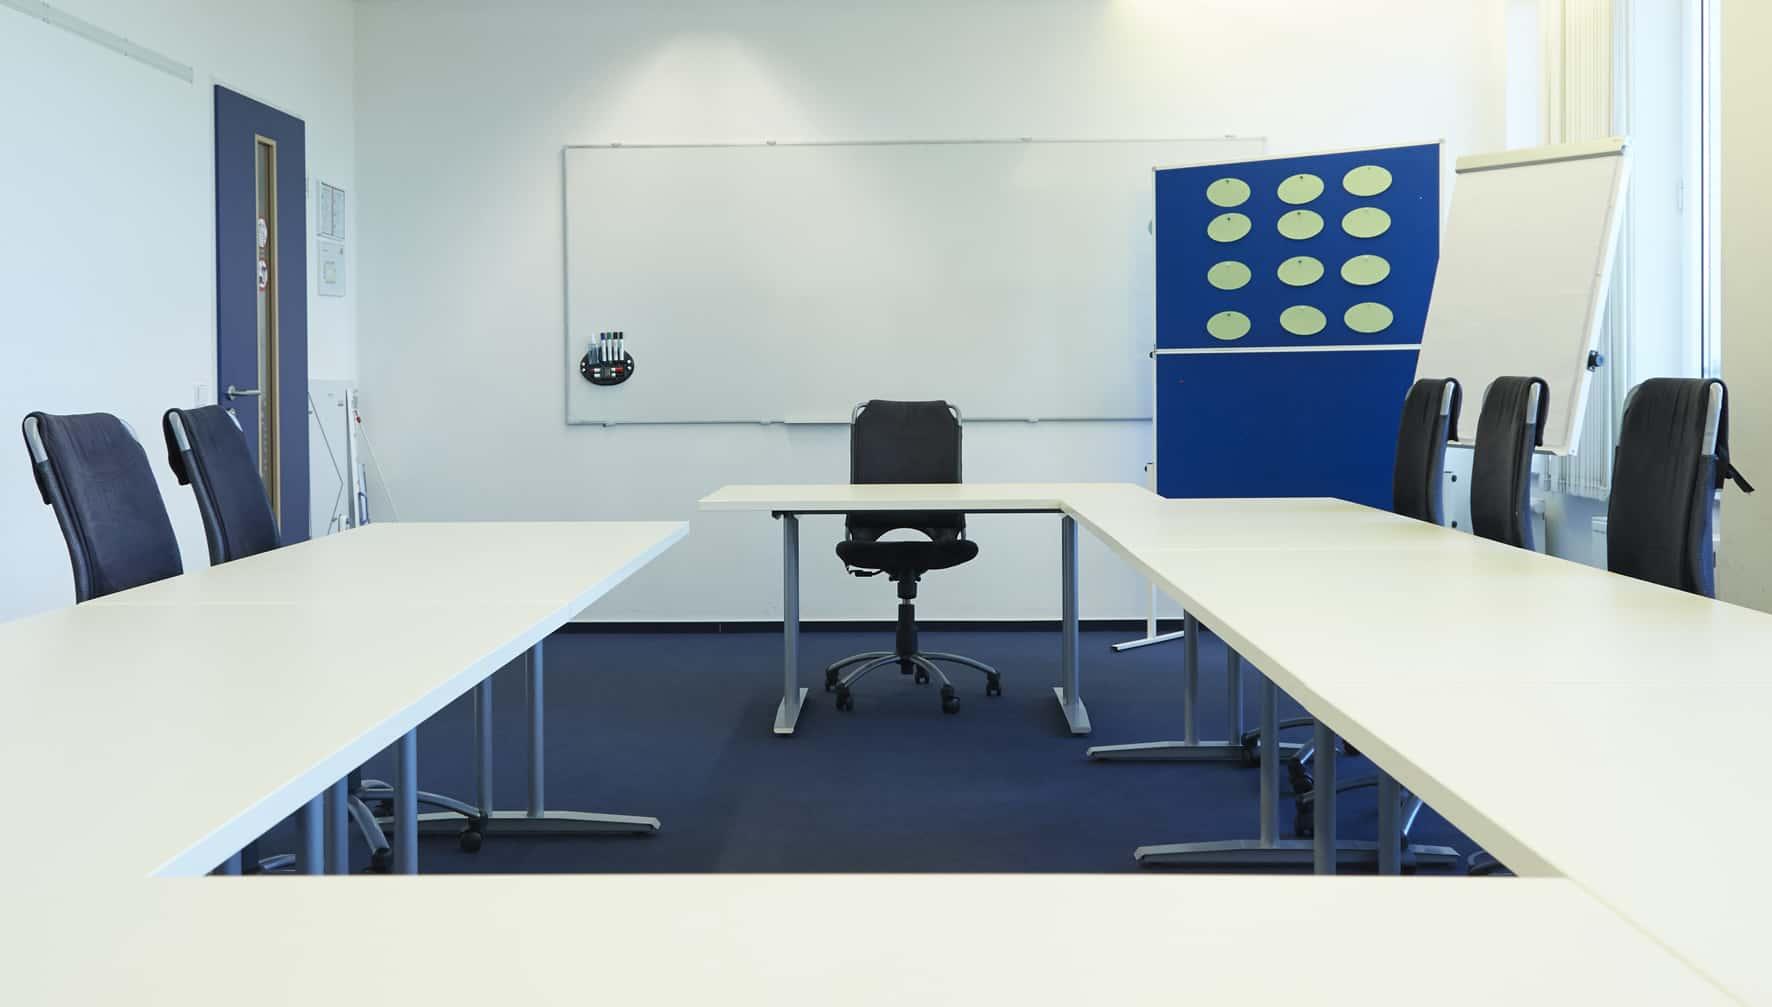 Seminarraum 2   itb - Institut für Training und Beratung in Hamburg